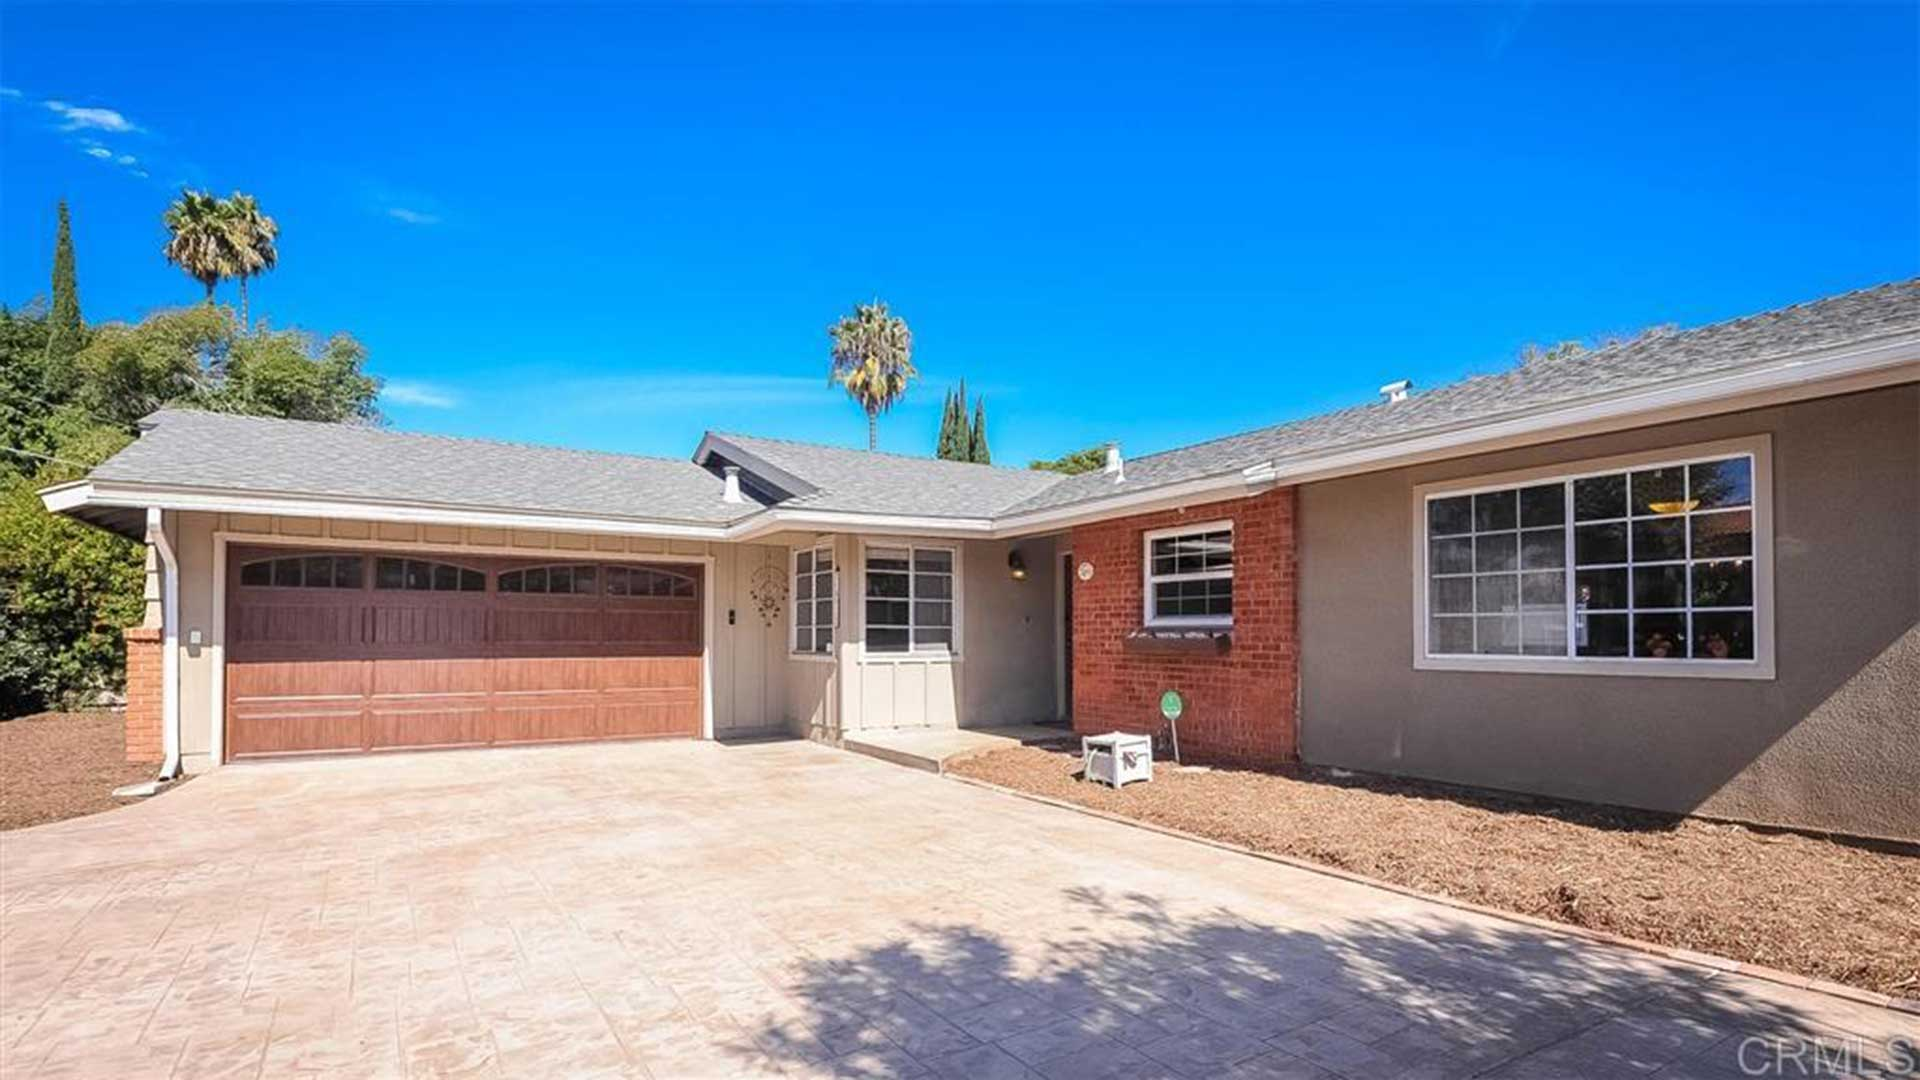 3478 Glen Abbey Blvd. Chula Vista, CA 91910